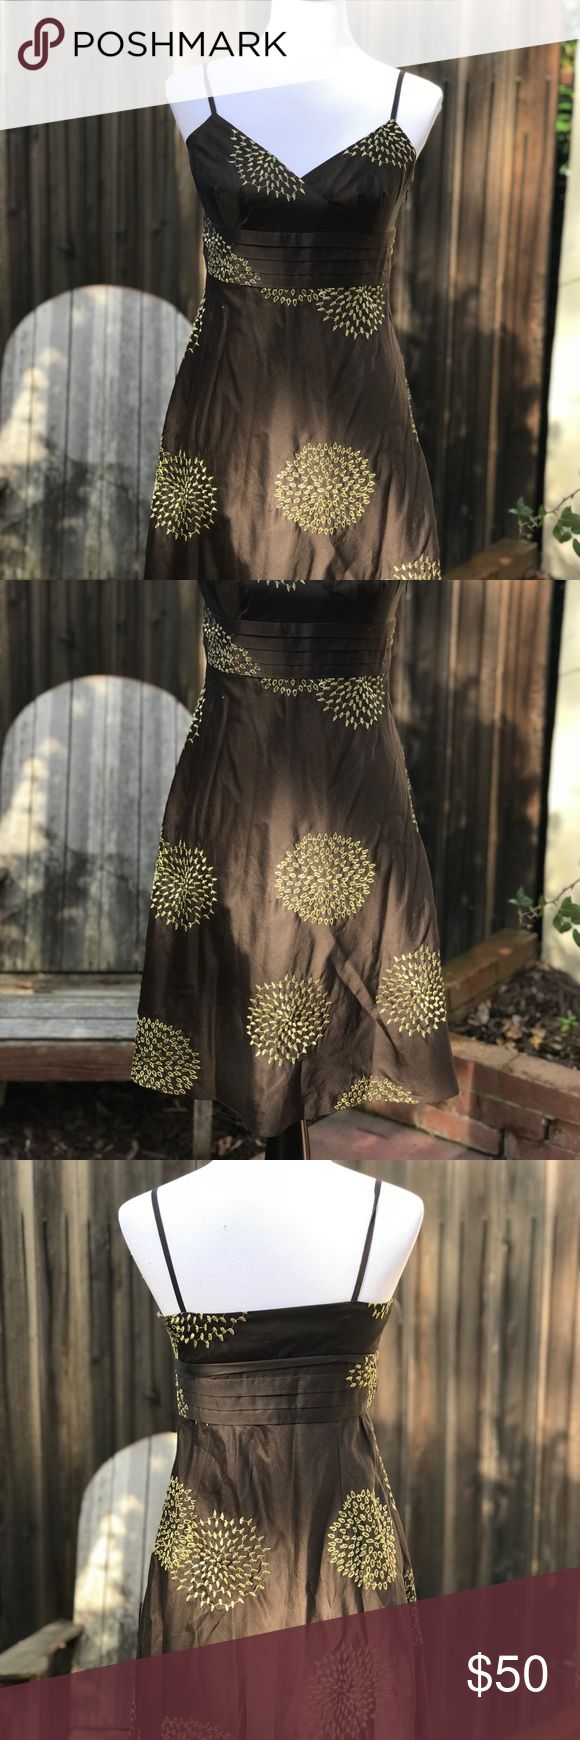 "Ann Taylor Brown/Gold Metallic Dress Ann Taylor Petites Dress. Spaghetti Strap, a-line, hidden side zip. Deep chocolate brown with gold metallic accent design. Shell 100% cotton, lining 100% Polyester. Dress has no stretch. Measurements approx. Bust 16"", waist 15"", hip 20"", length 38"". Mannequin 34x26x35. NWT Ann Taylor Factory Dresses"